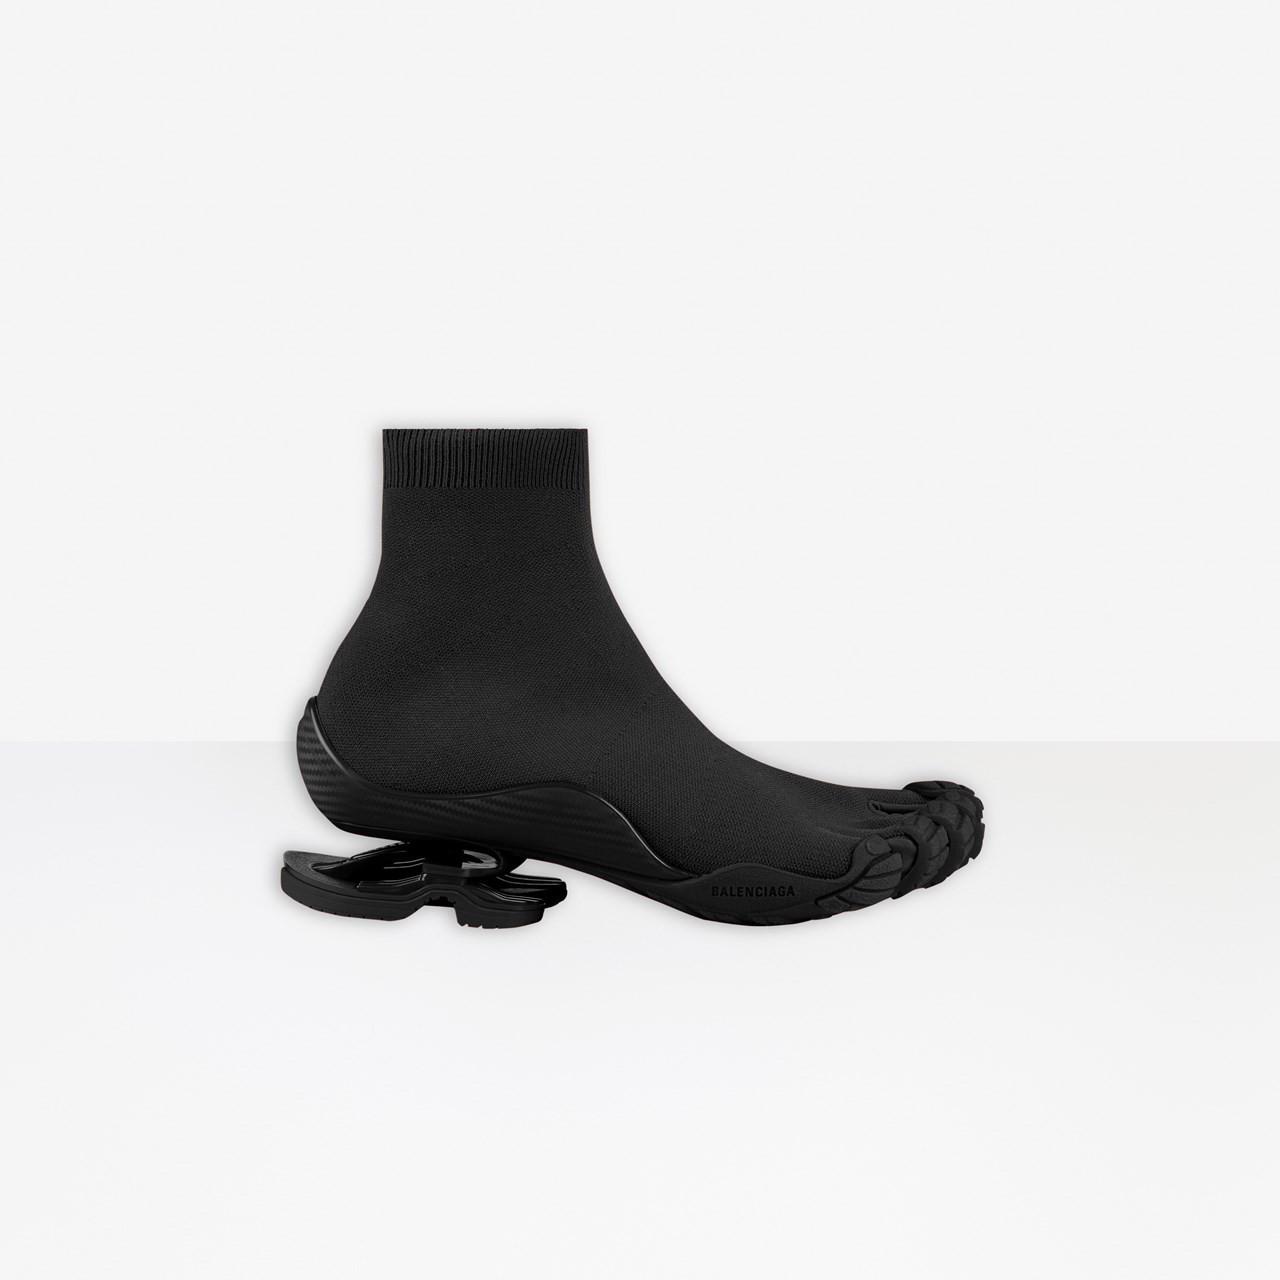 Vibram x Balenciaga Toe Sock